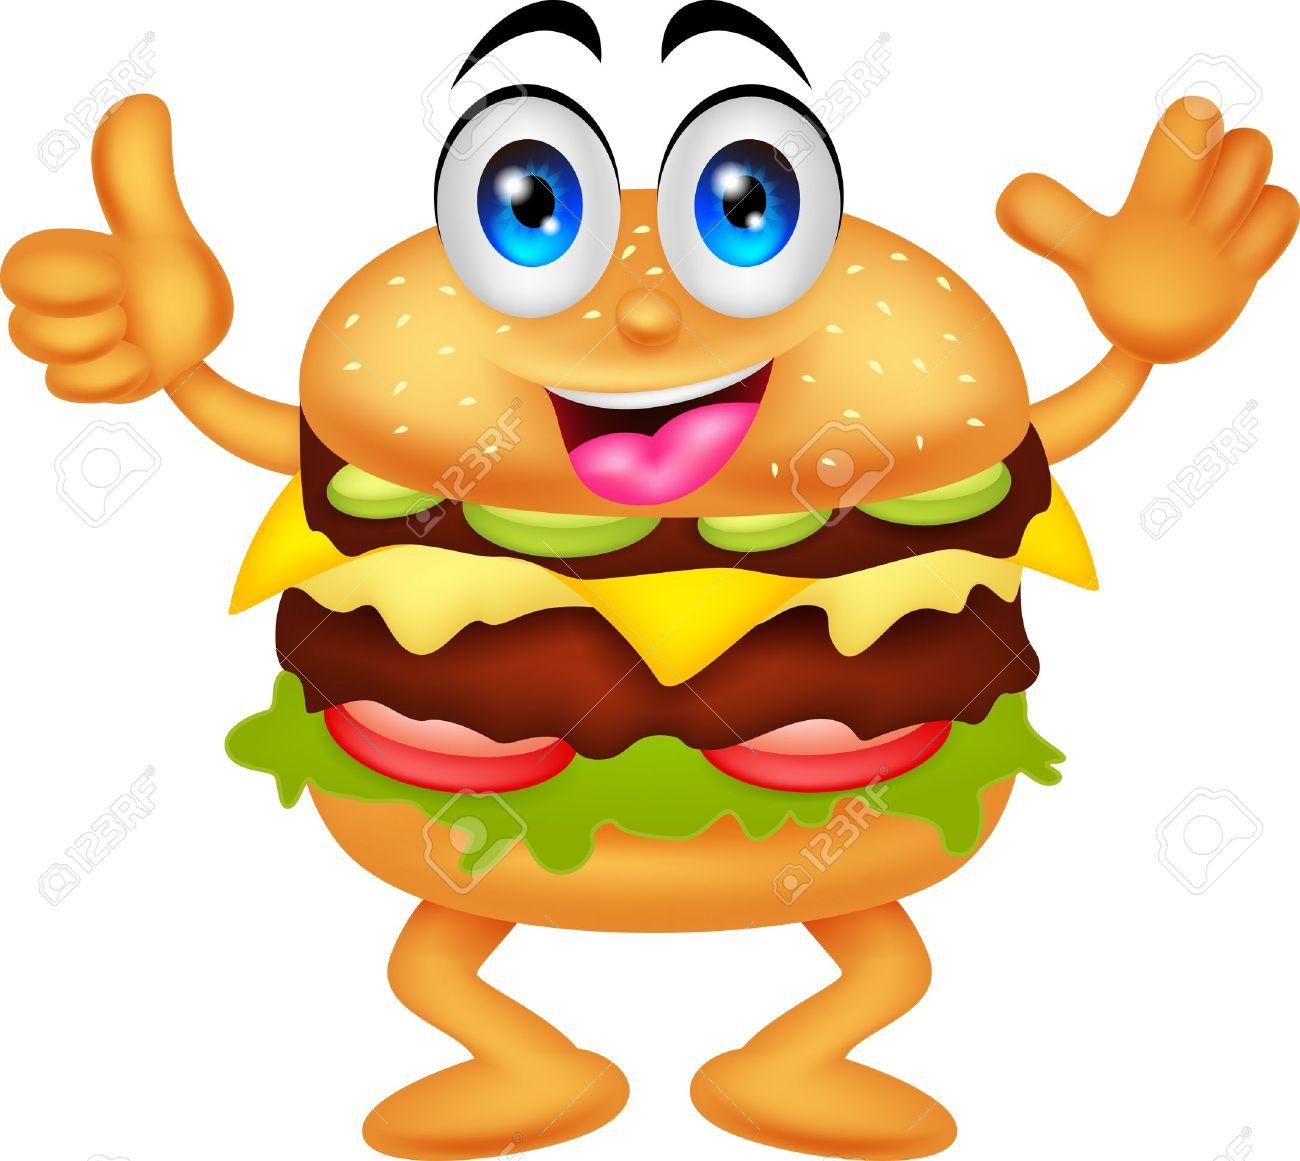 burger cartoon characters royalty free cliparts vectors and stock rh 123rf com burger clipart images burger clip art free